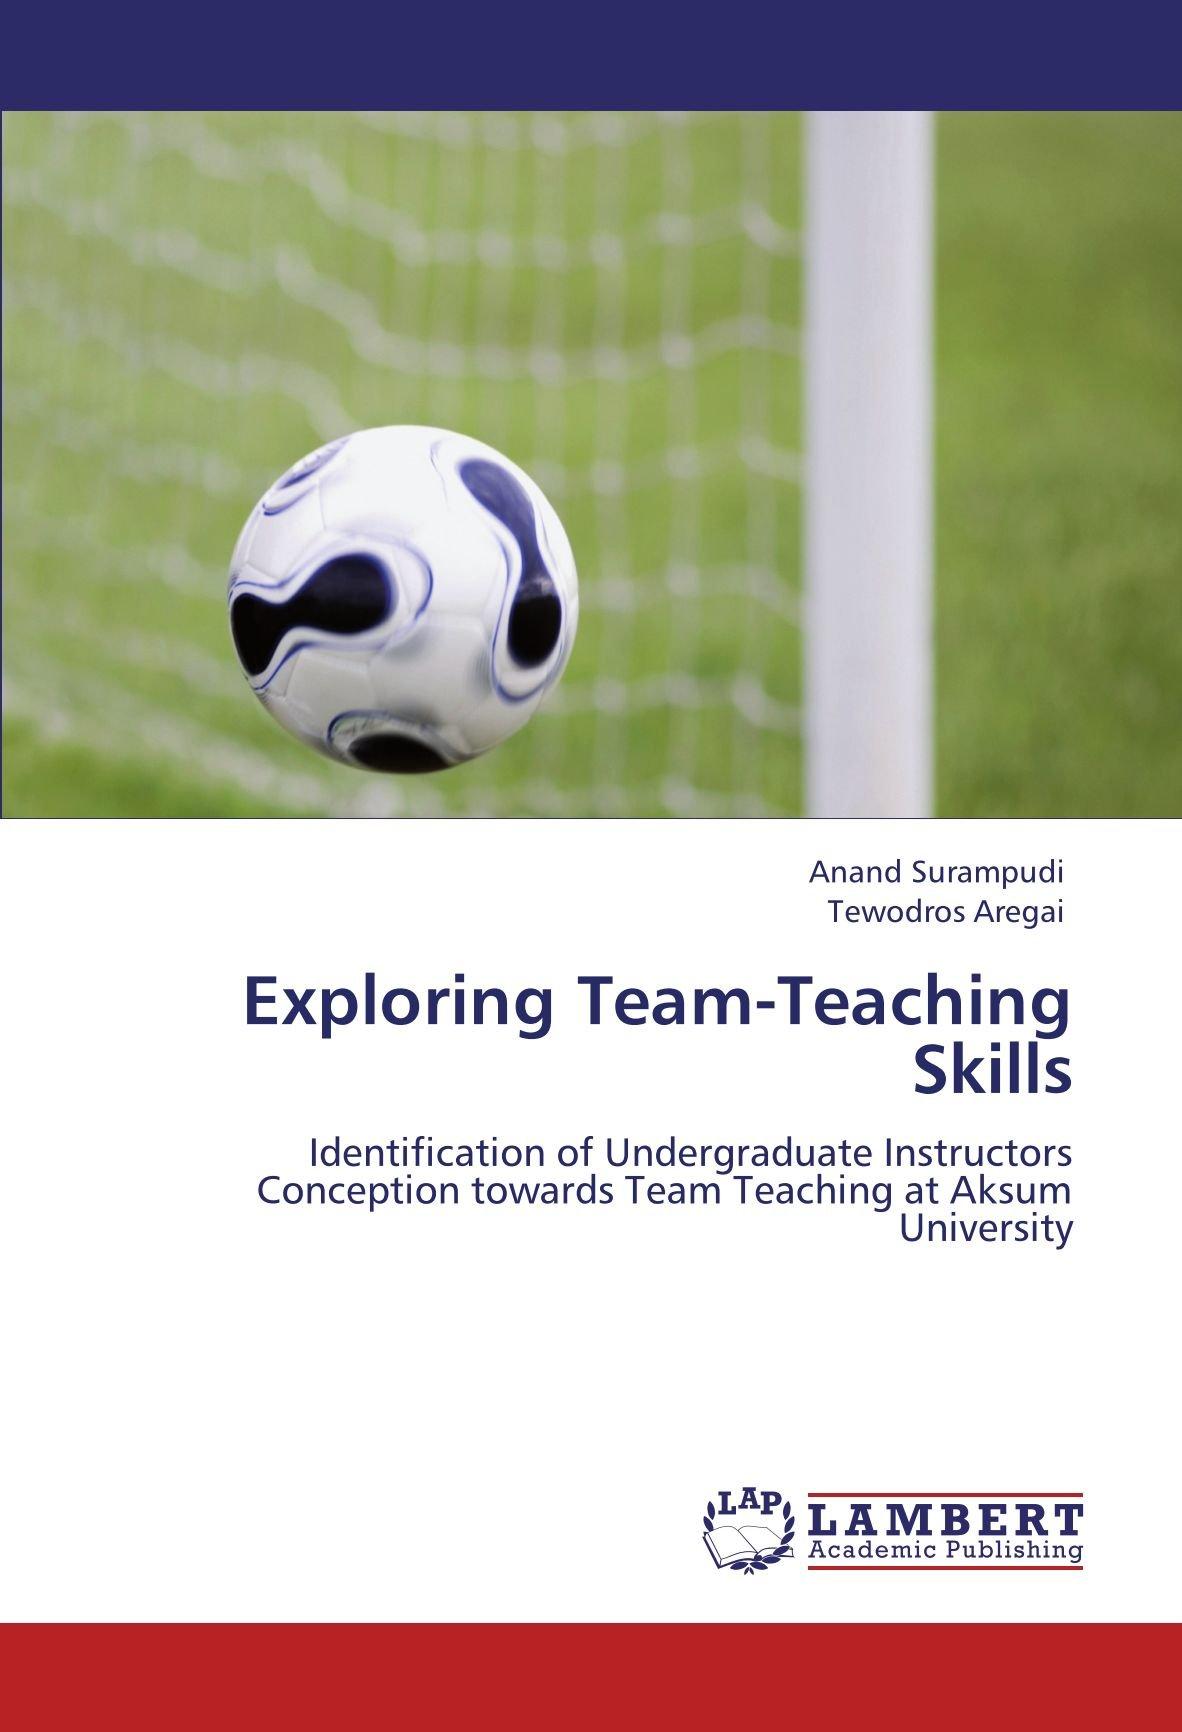 Exploring Team-Teaching Skills: Identification of Undergraduate